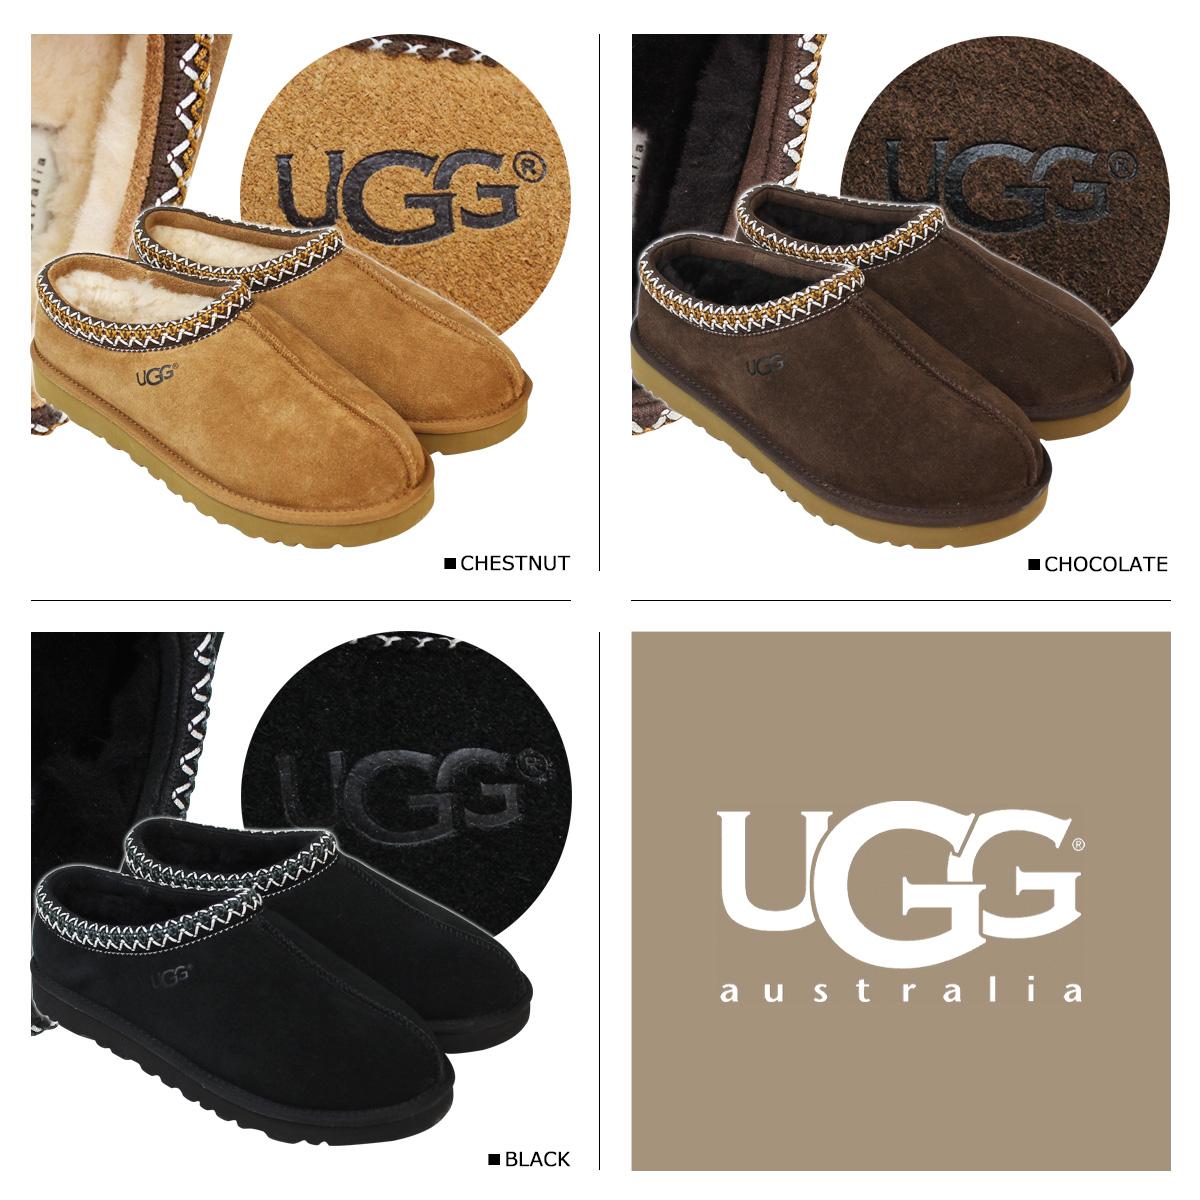 8a5c216b67f アグ UGG slip-ons mouton TASS man men sheepskin MENS TASMAN black brown black  5950